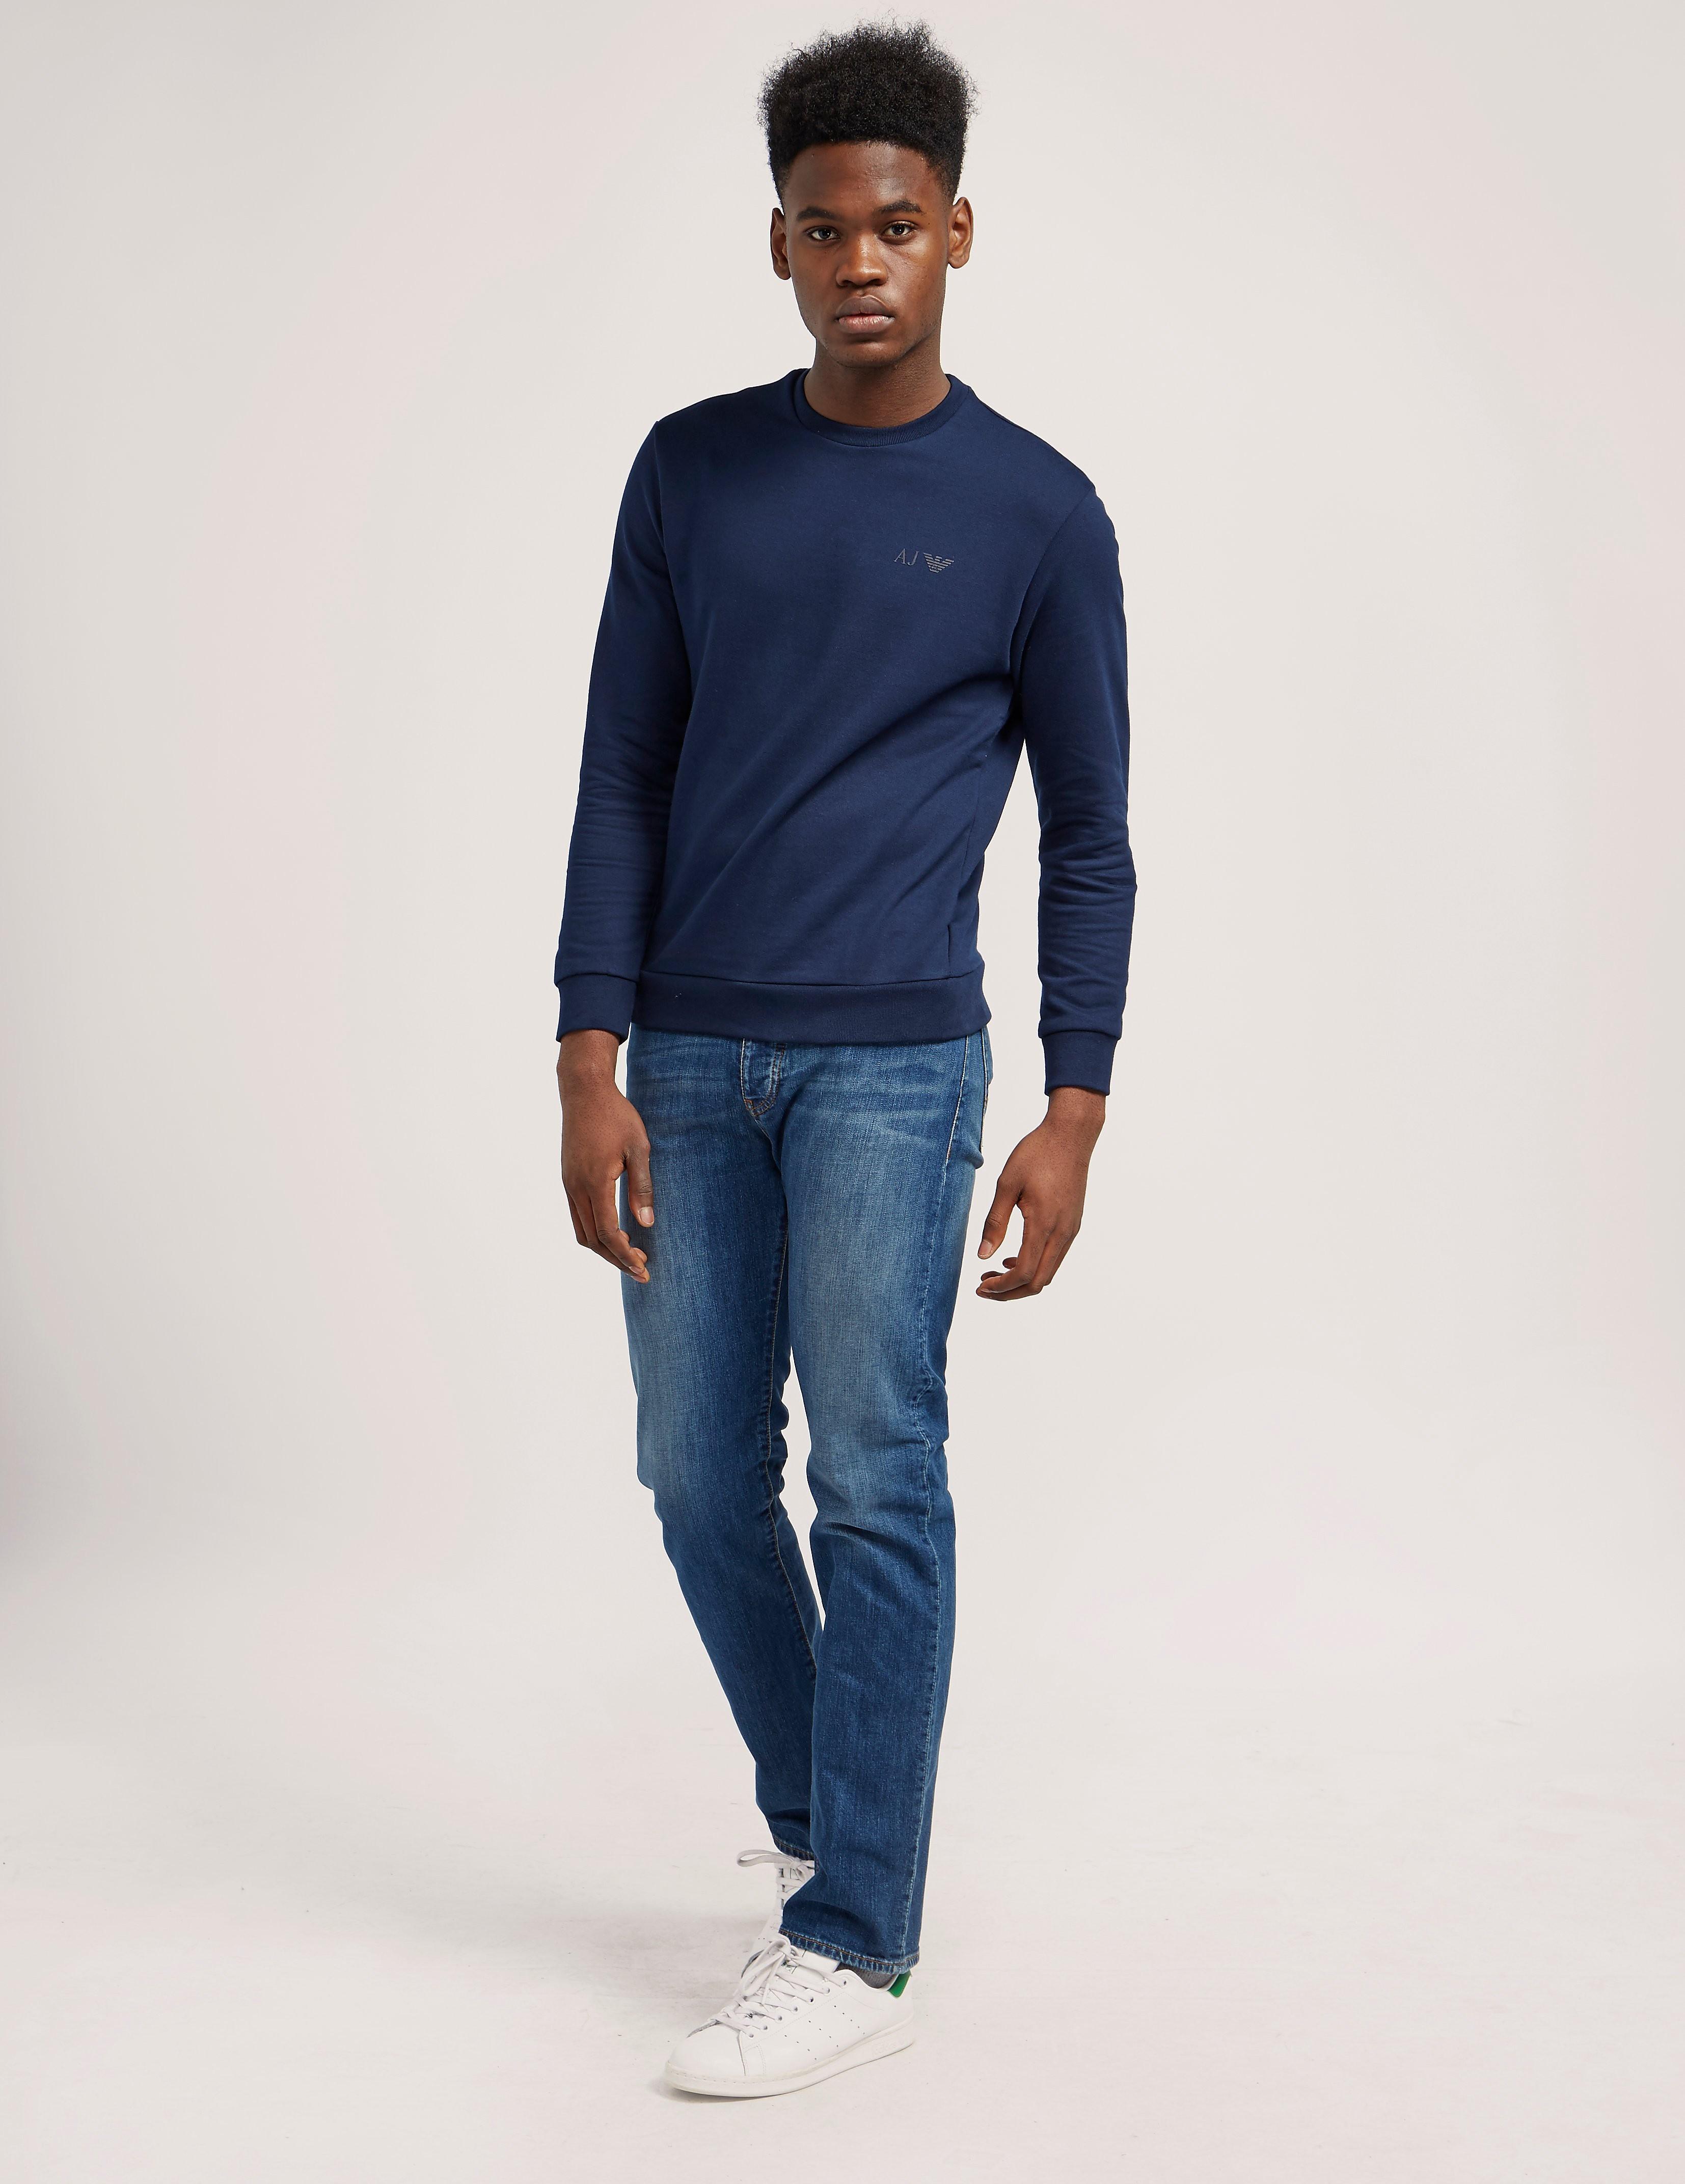 Armani Jeans J21 Regular Fit Jean - Long